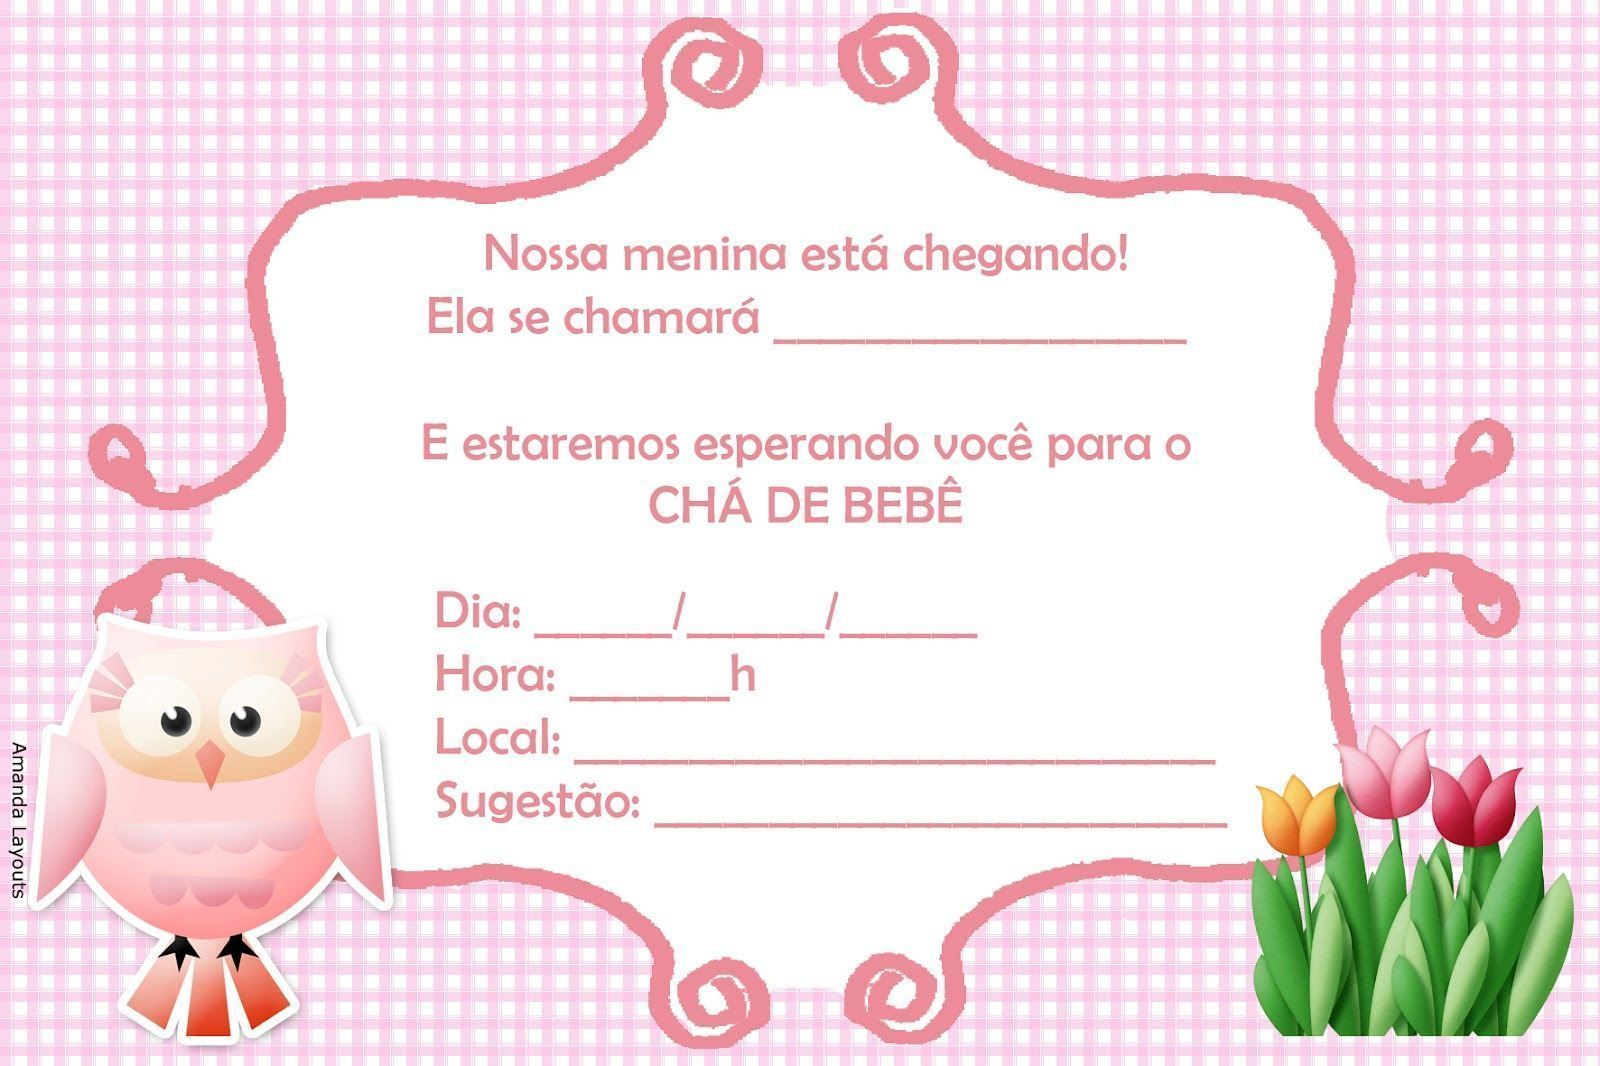 garota-cha-bebe2